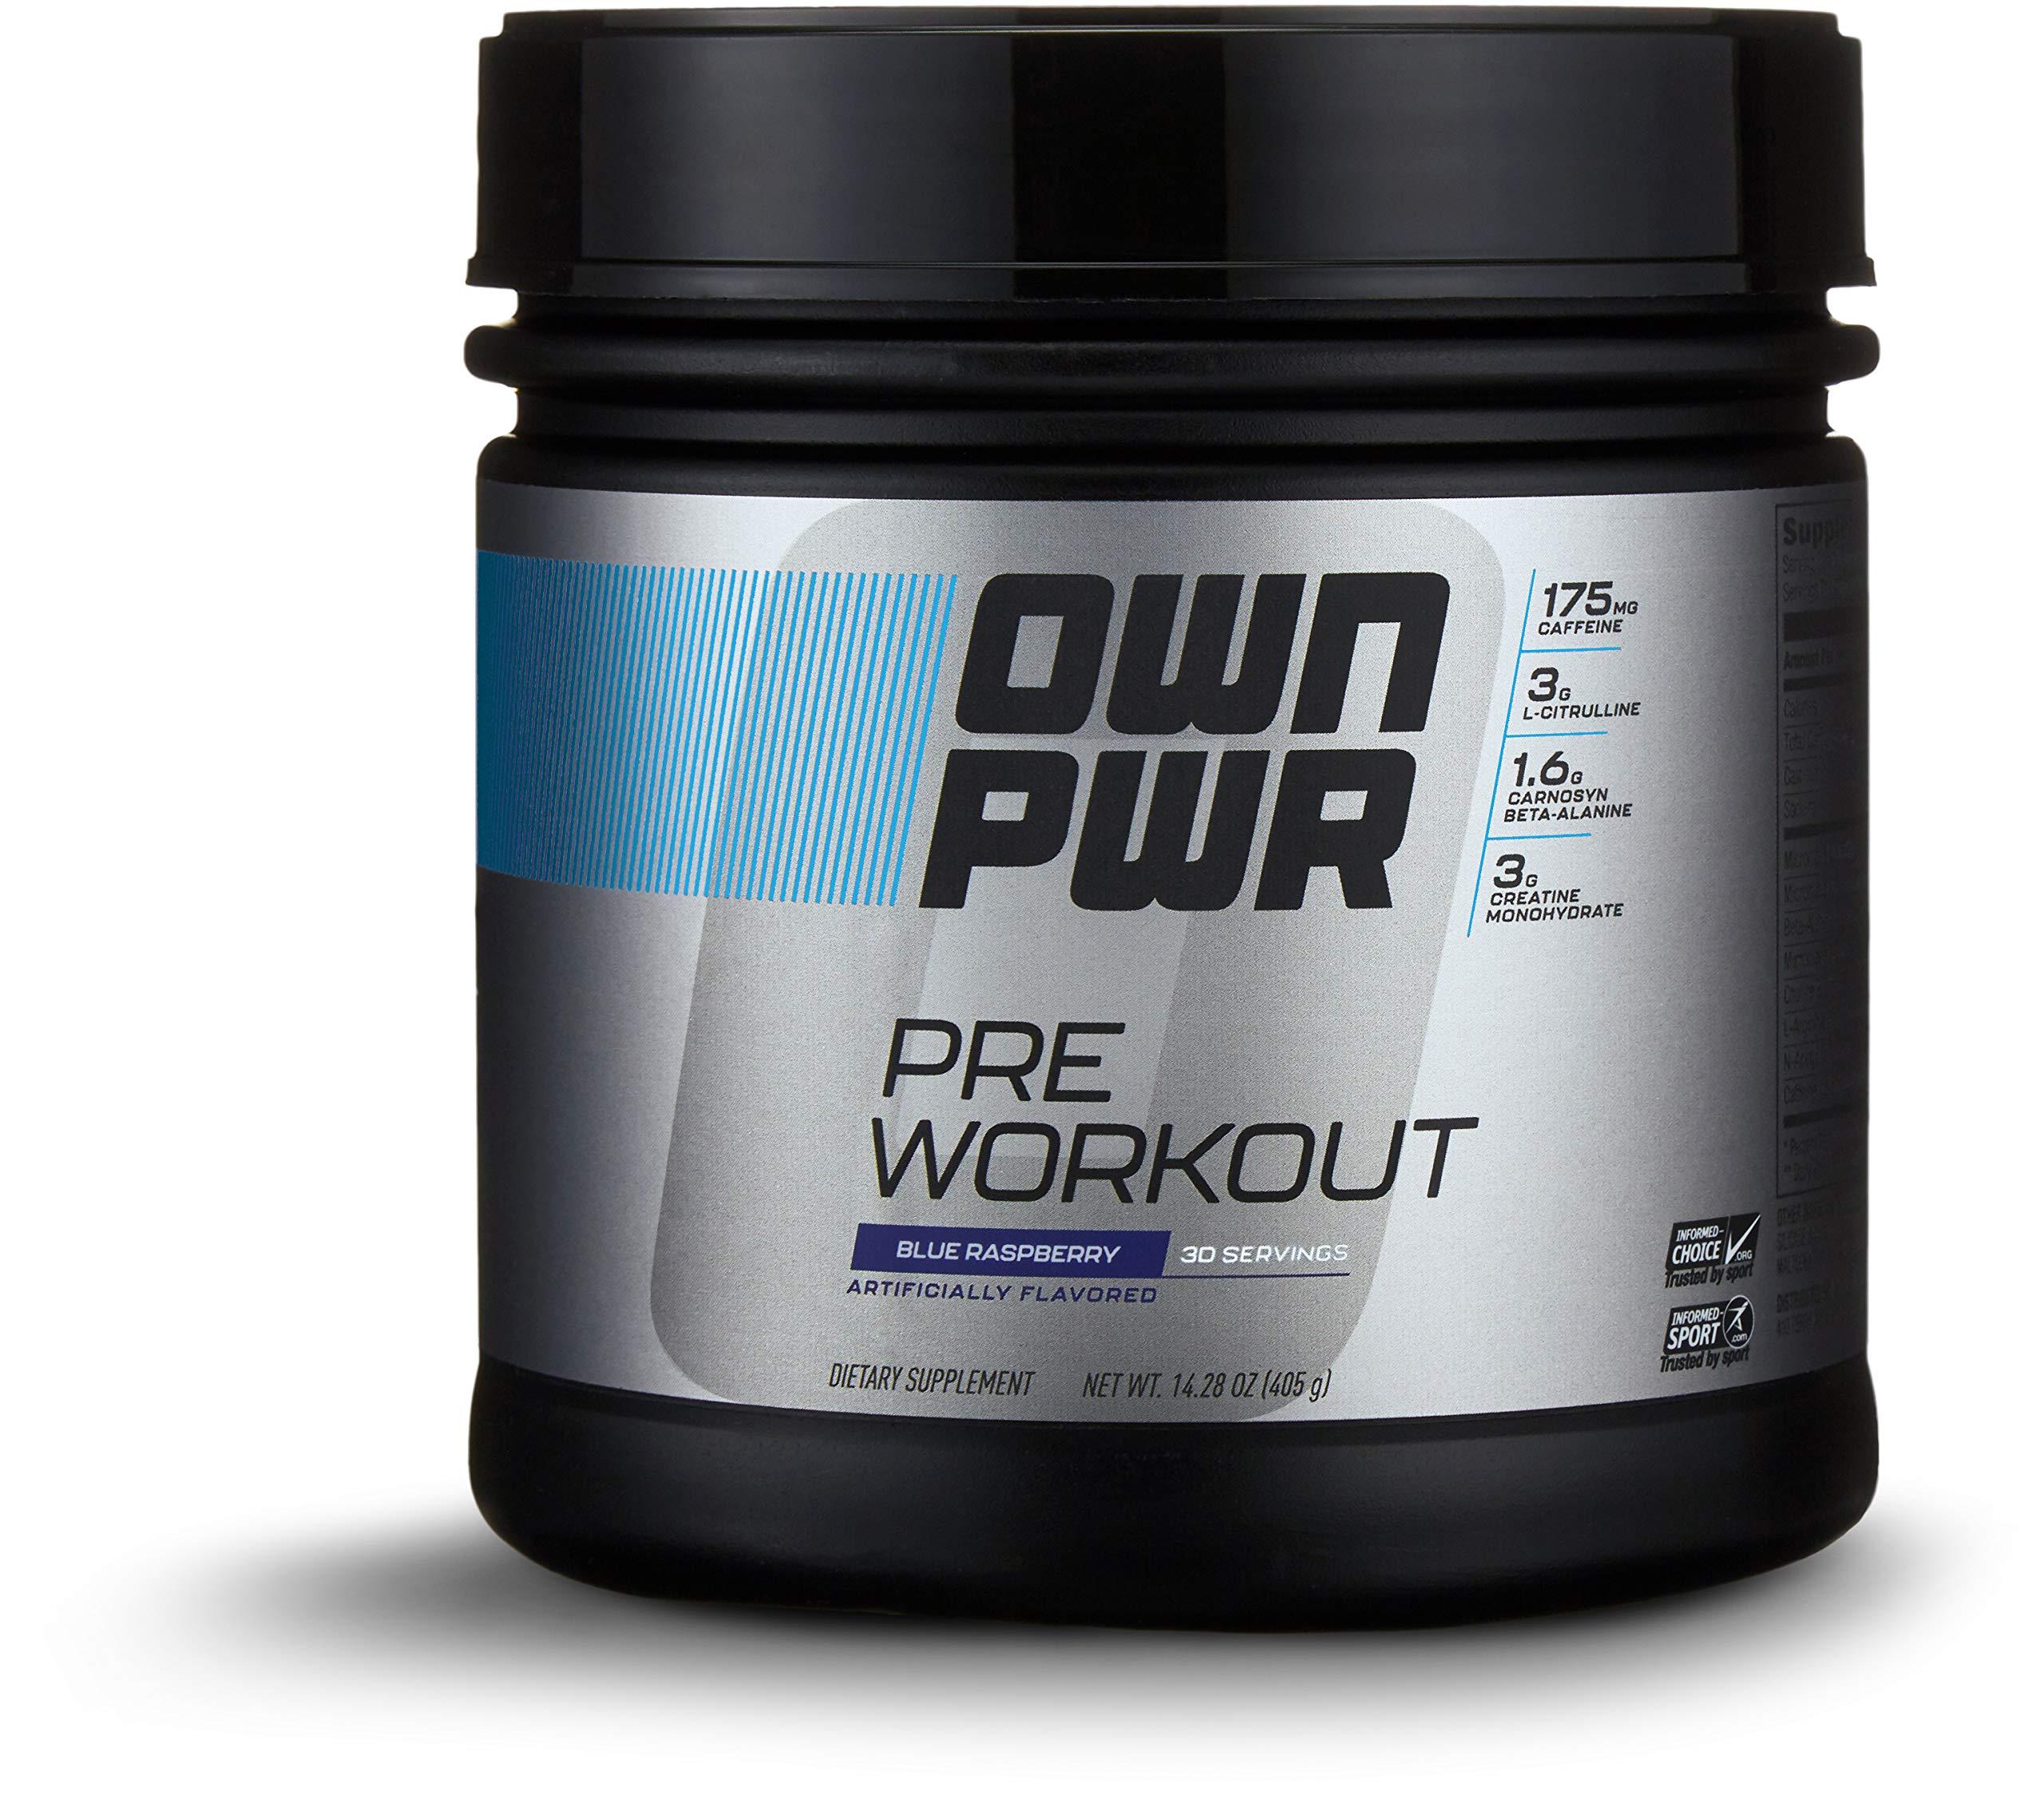 OWN PWR Pre Workout Powder, Blue Raspberry, 30 Servings, Keto Friendly, 3G Creatine, 1.6G Beta Alanine (as CarnoSyn), 175 MG Caffeine & more